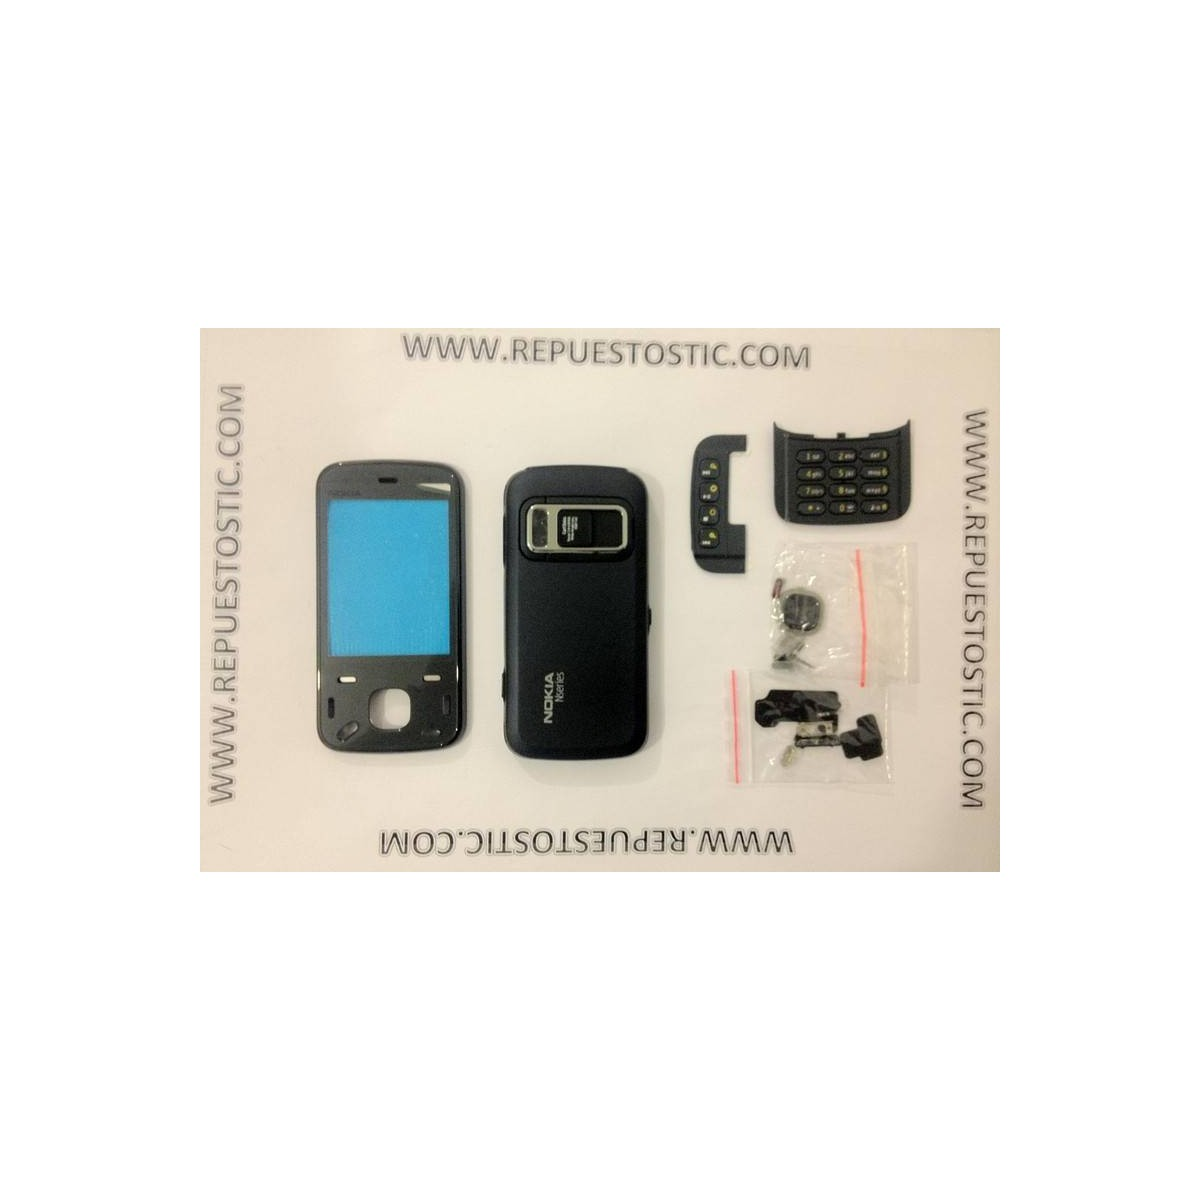 Carcasa Nokia N86 Completa